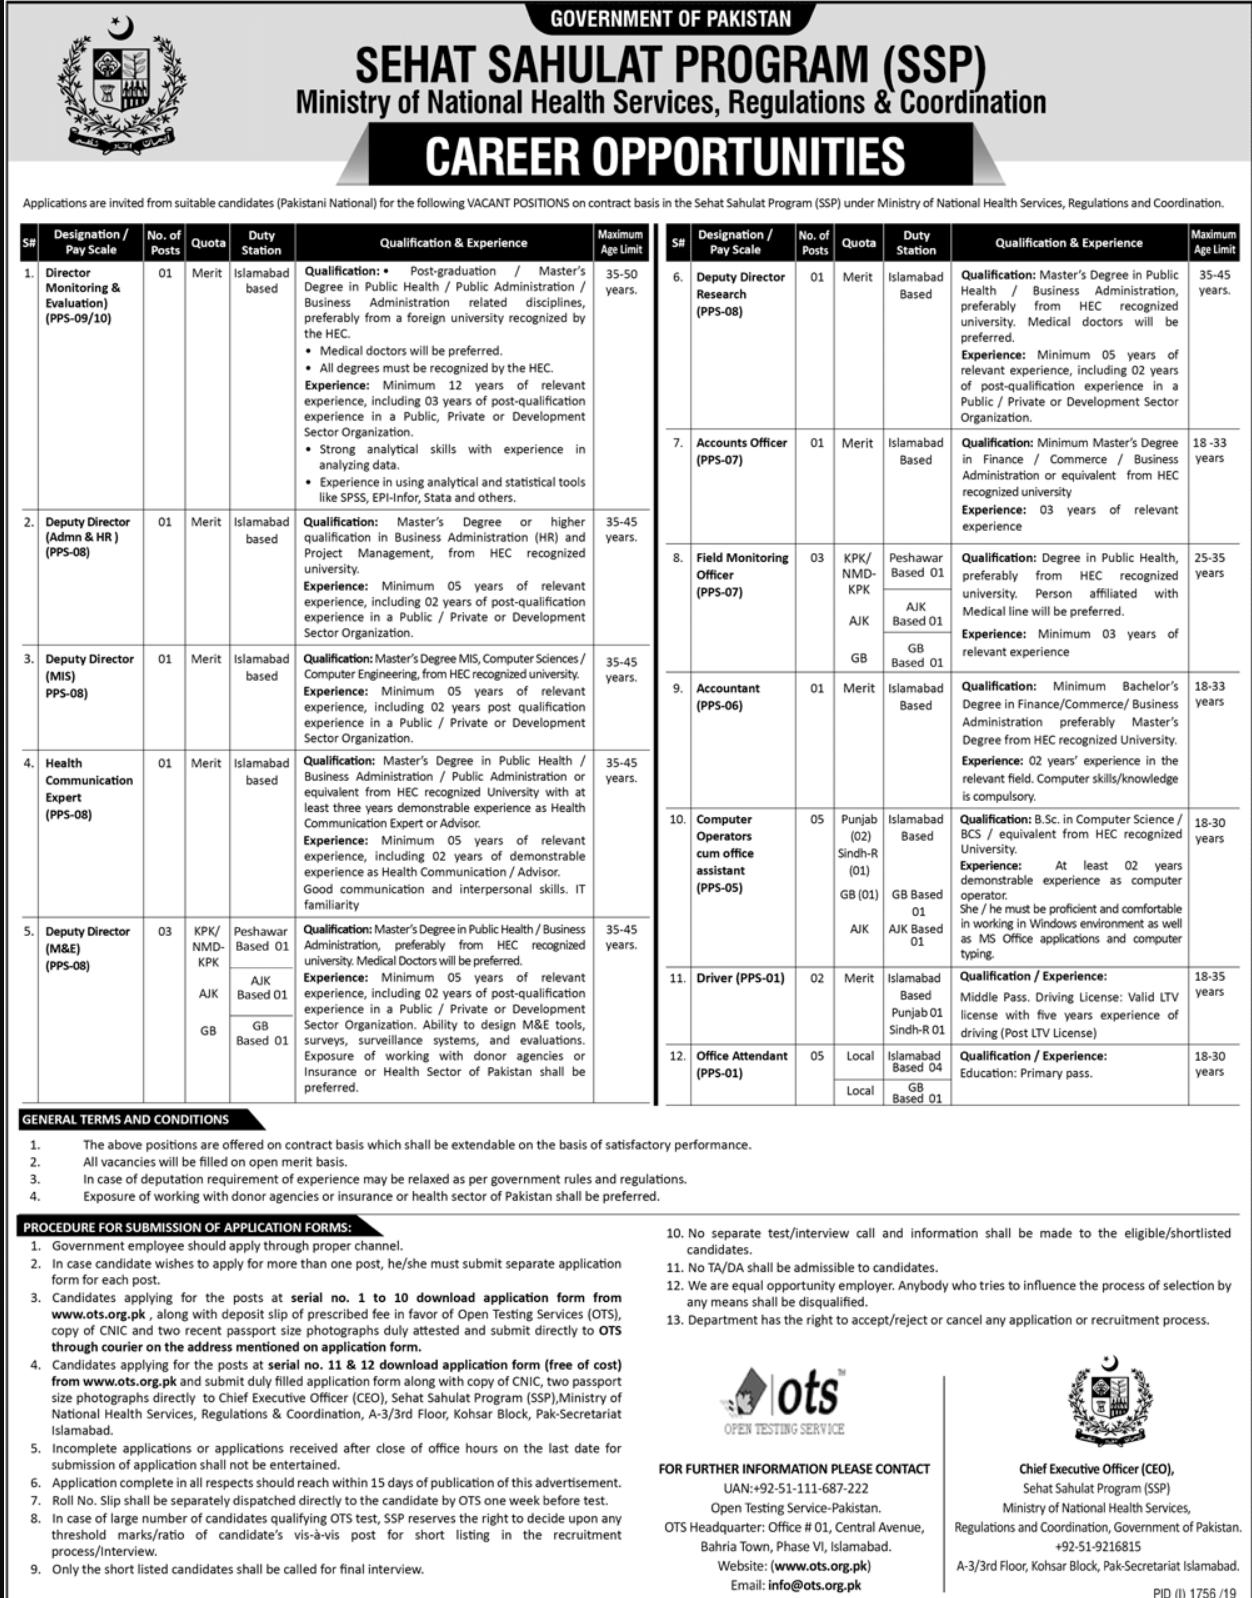 Sehat Sahulat Program SSP NHSRC Jobs OTS Test Result